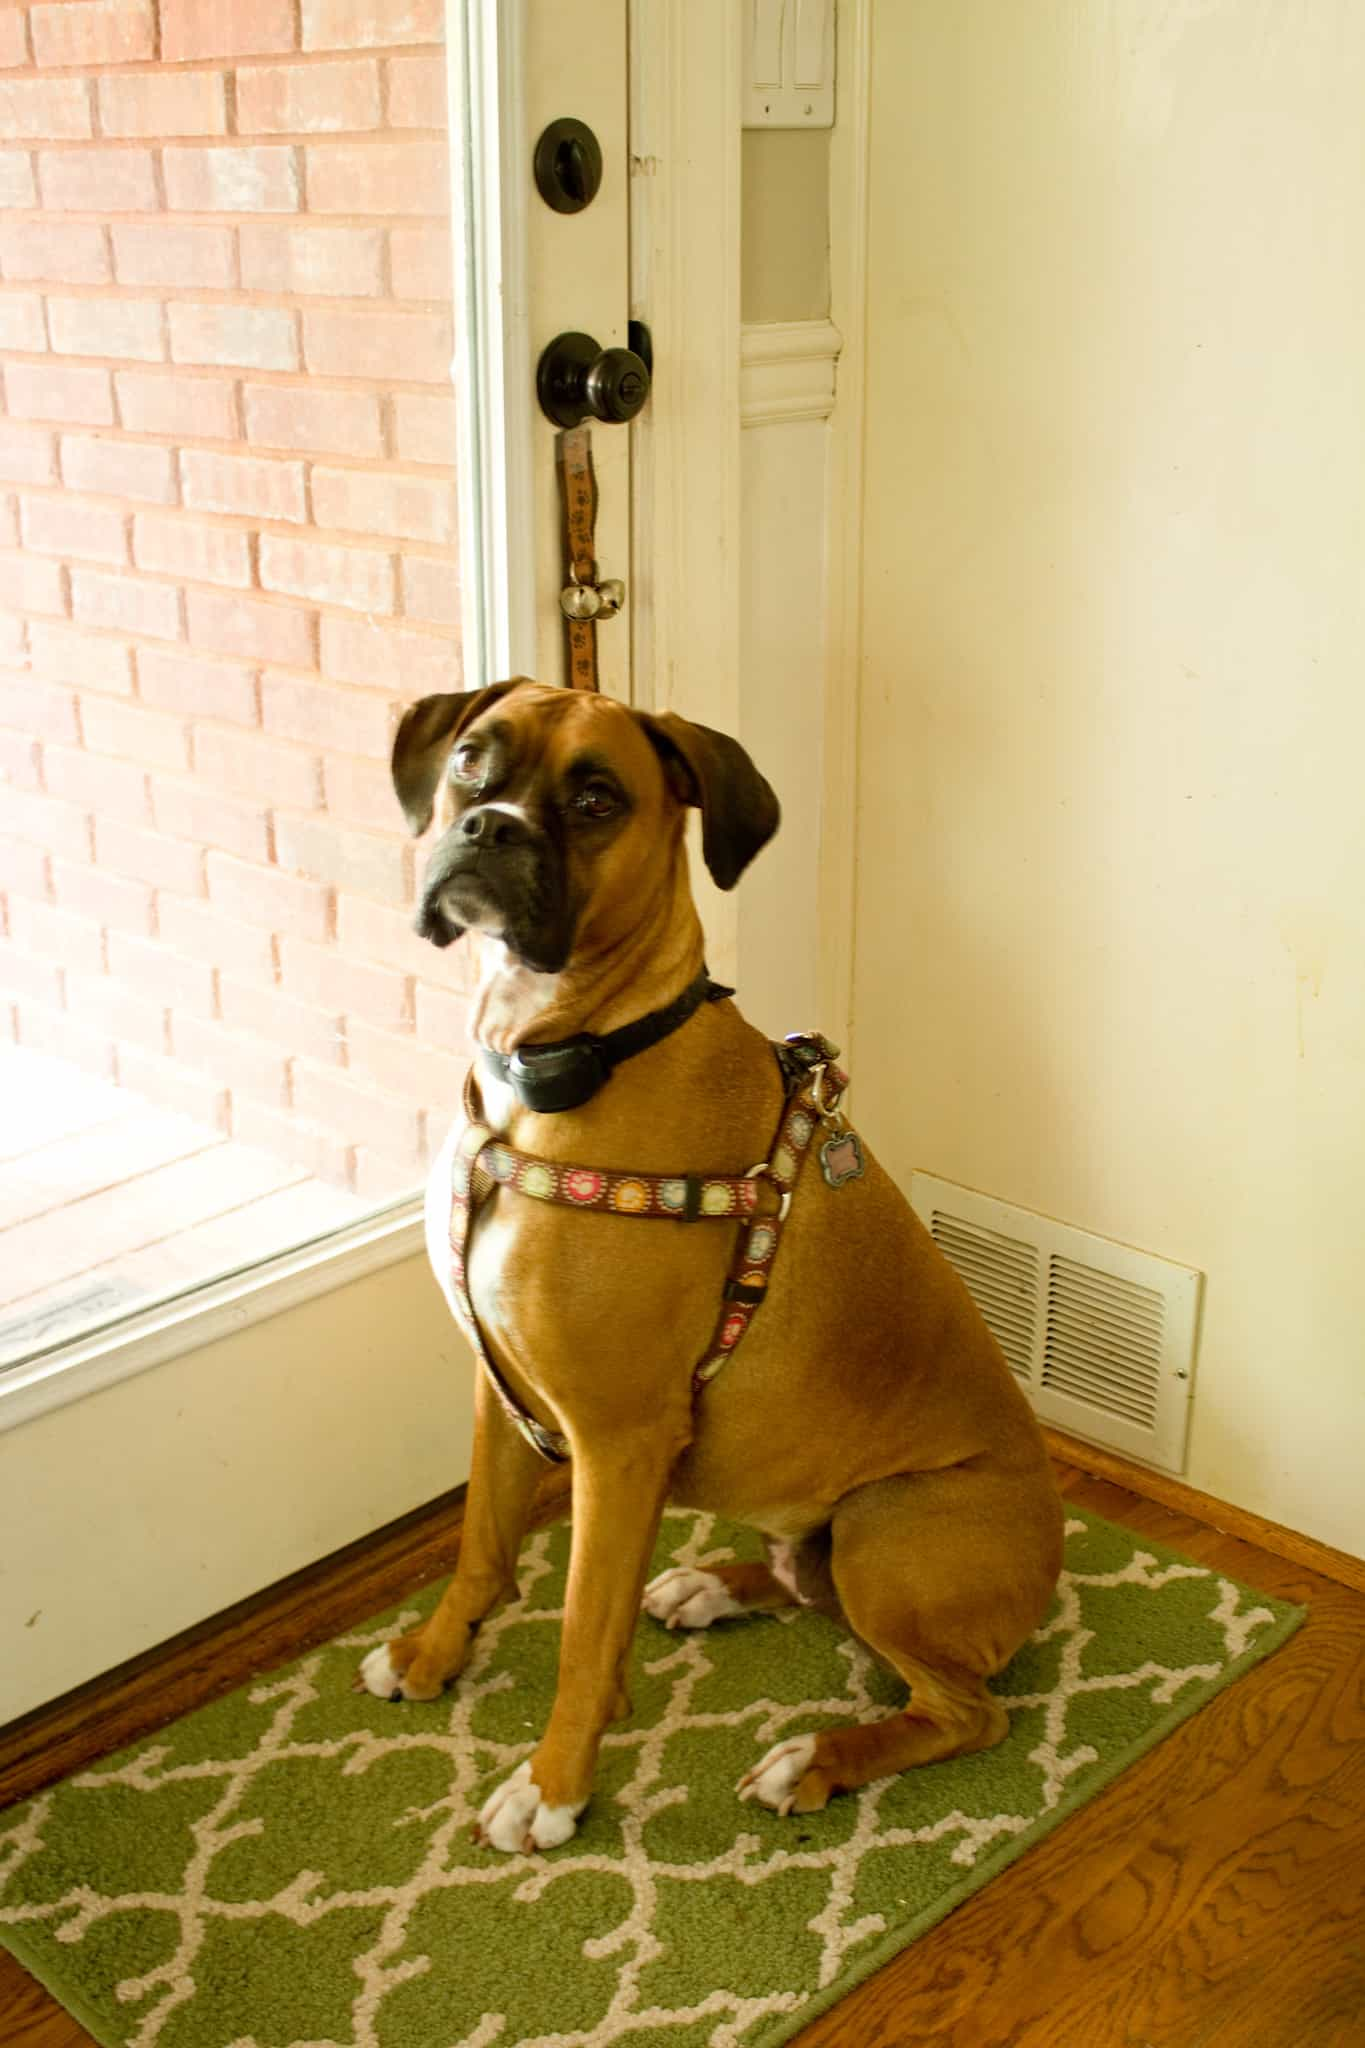 How To Train A Dog To Go Potty Outside